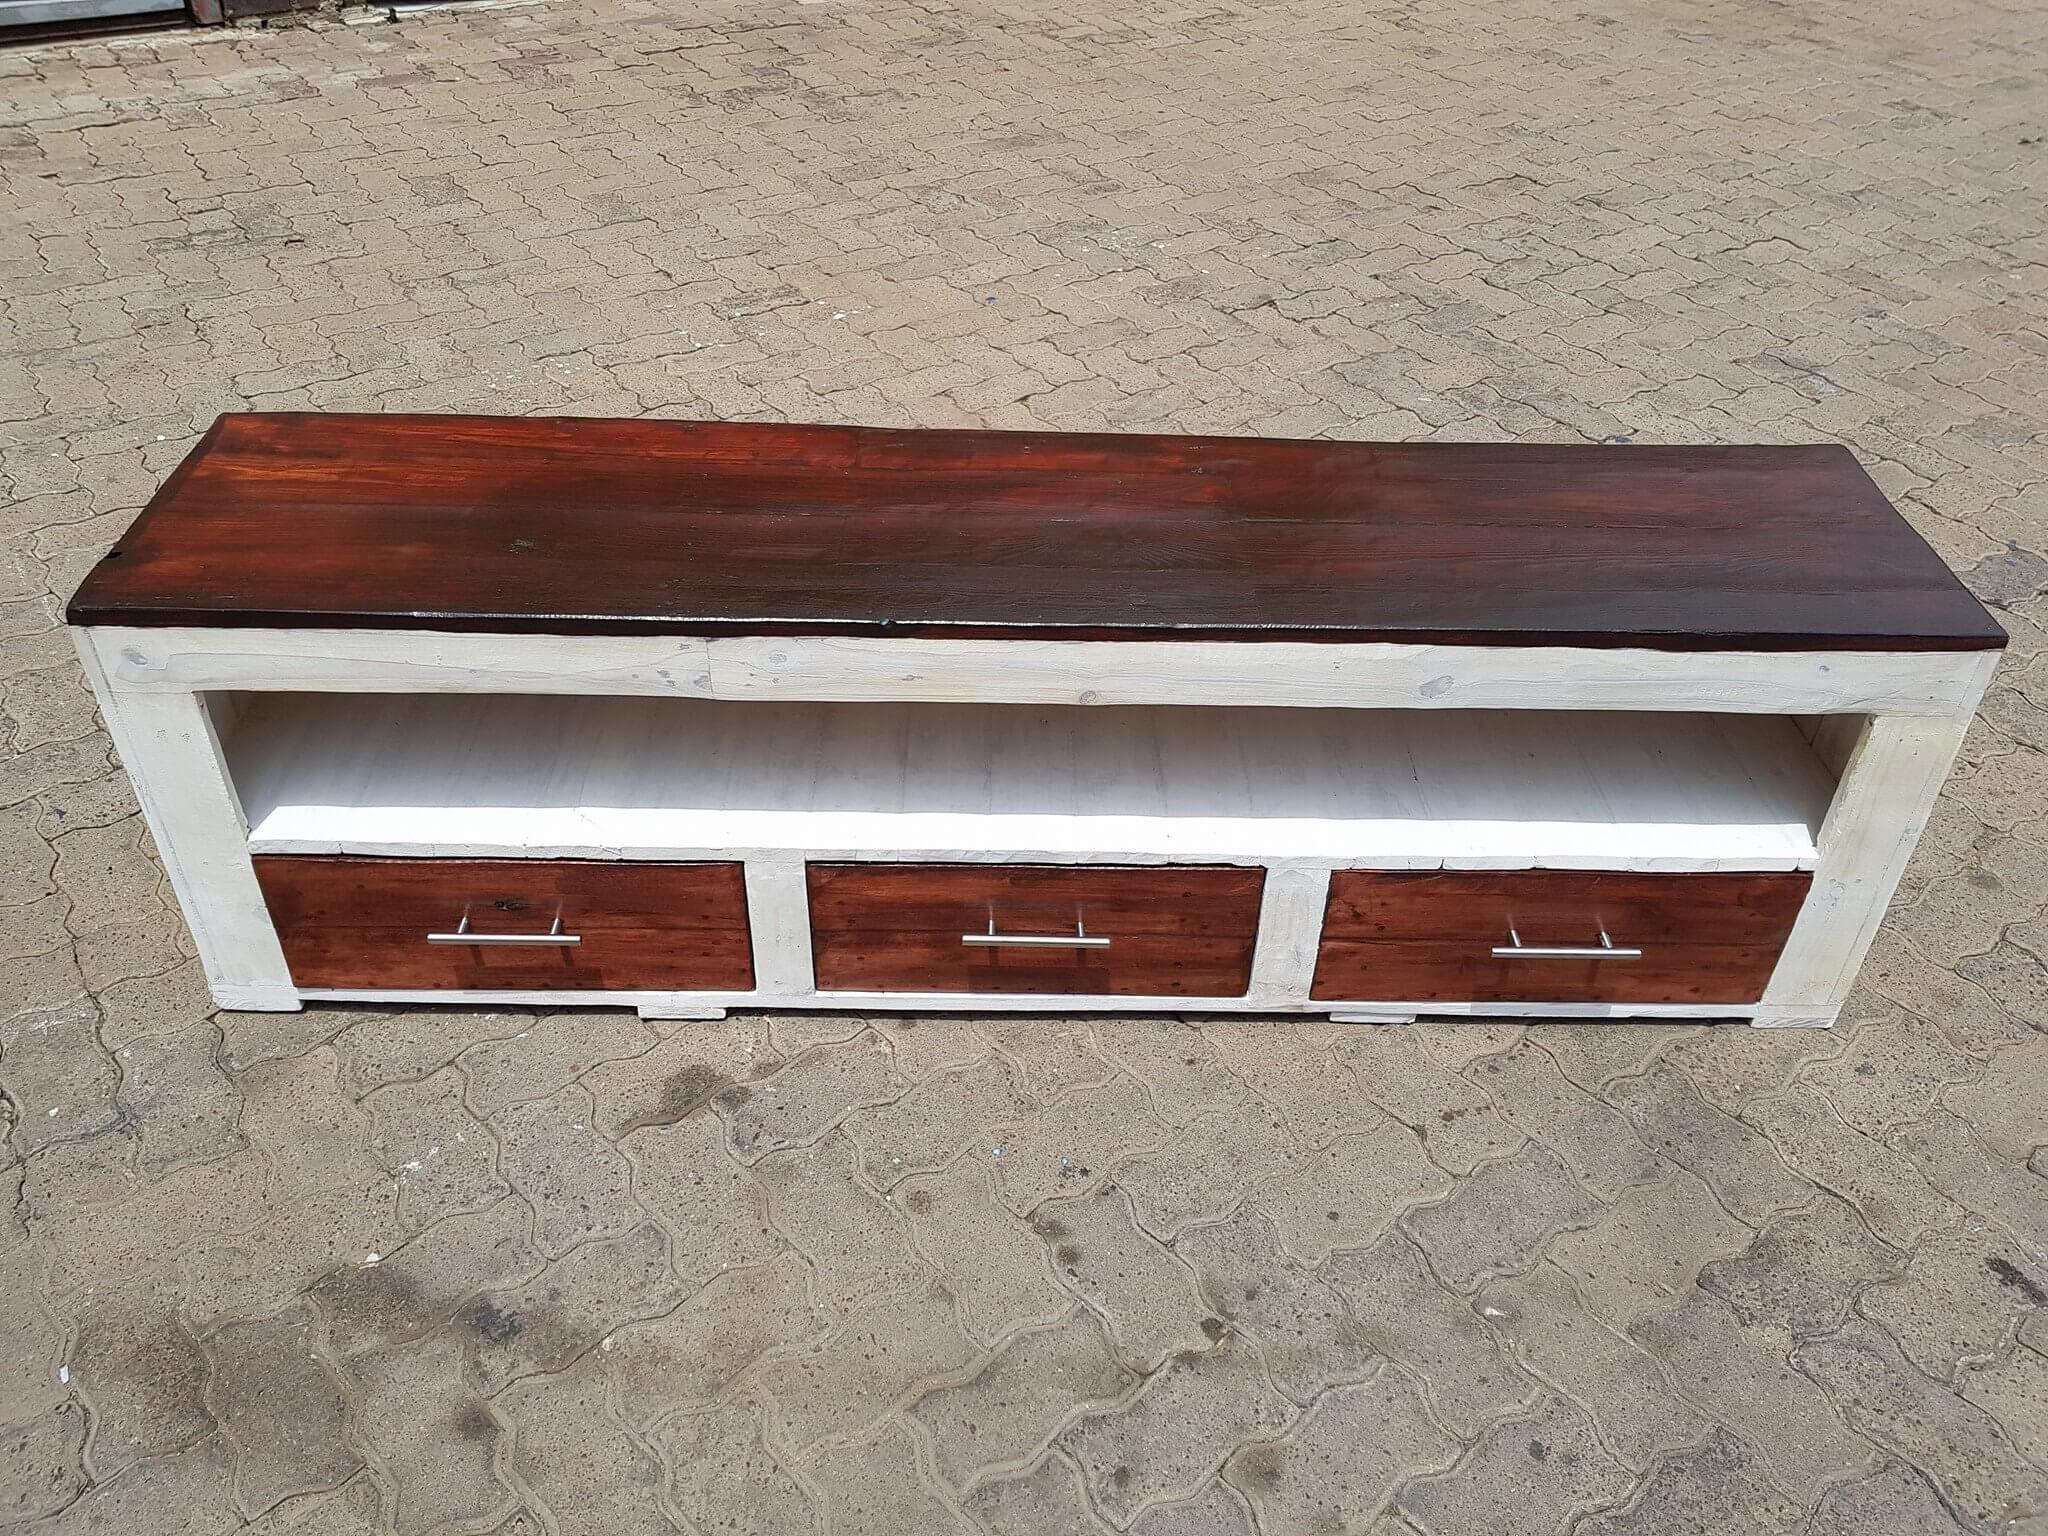 The  unique TV cabinet design: